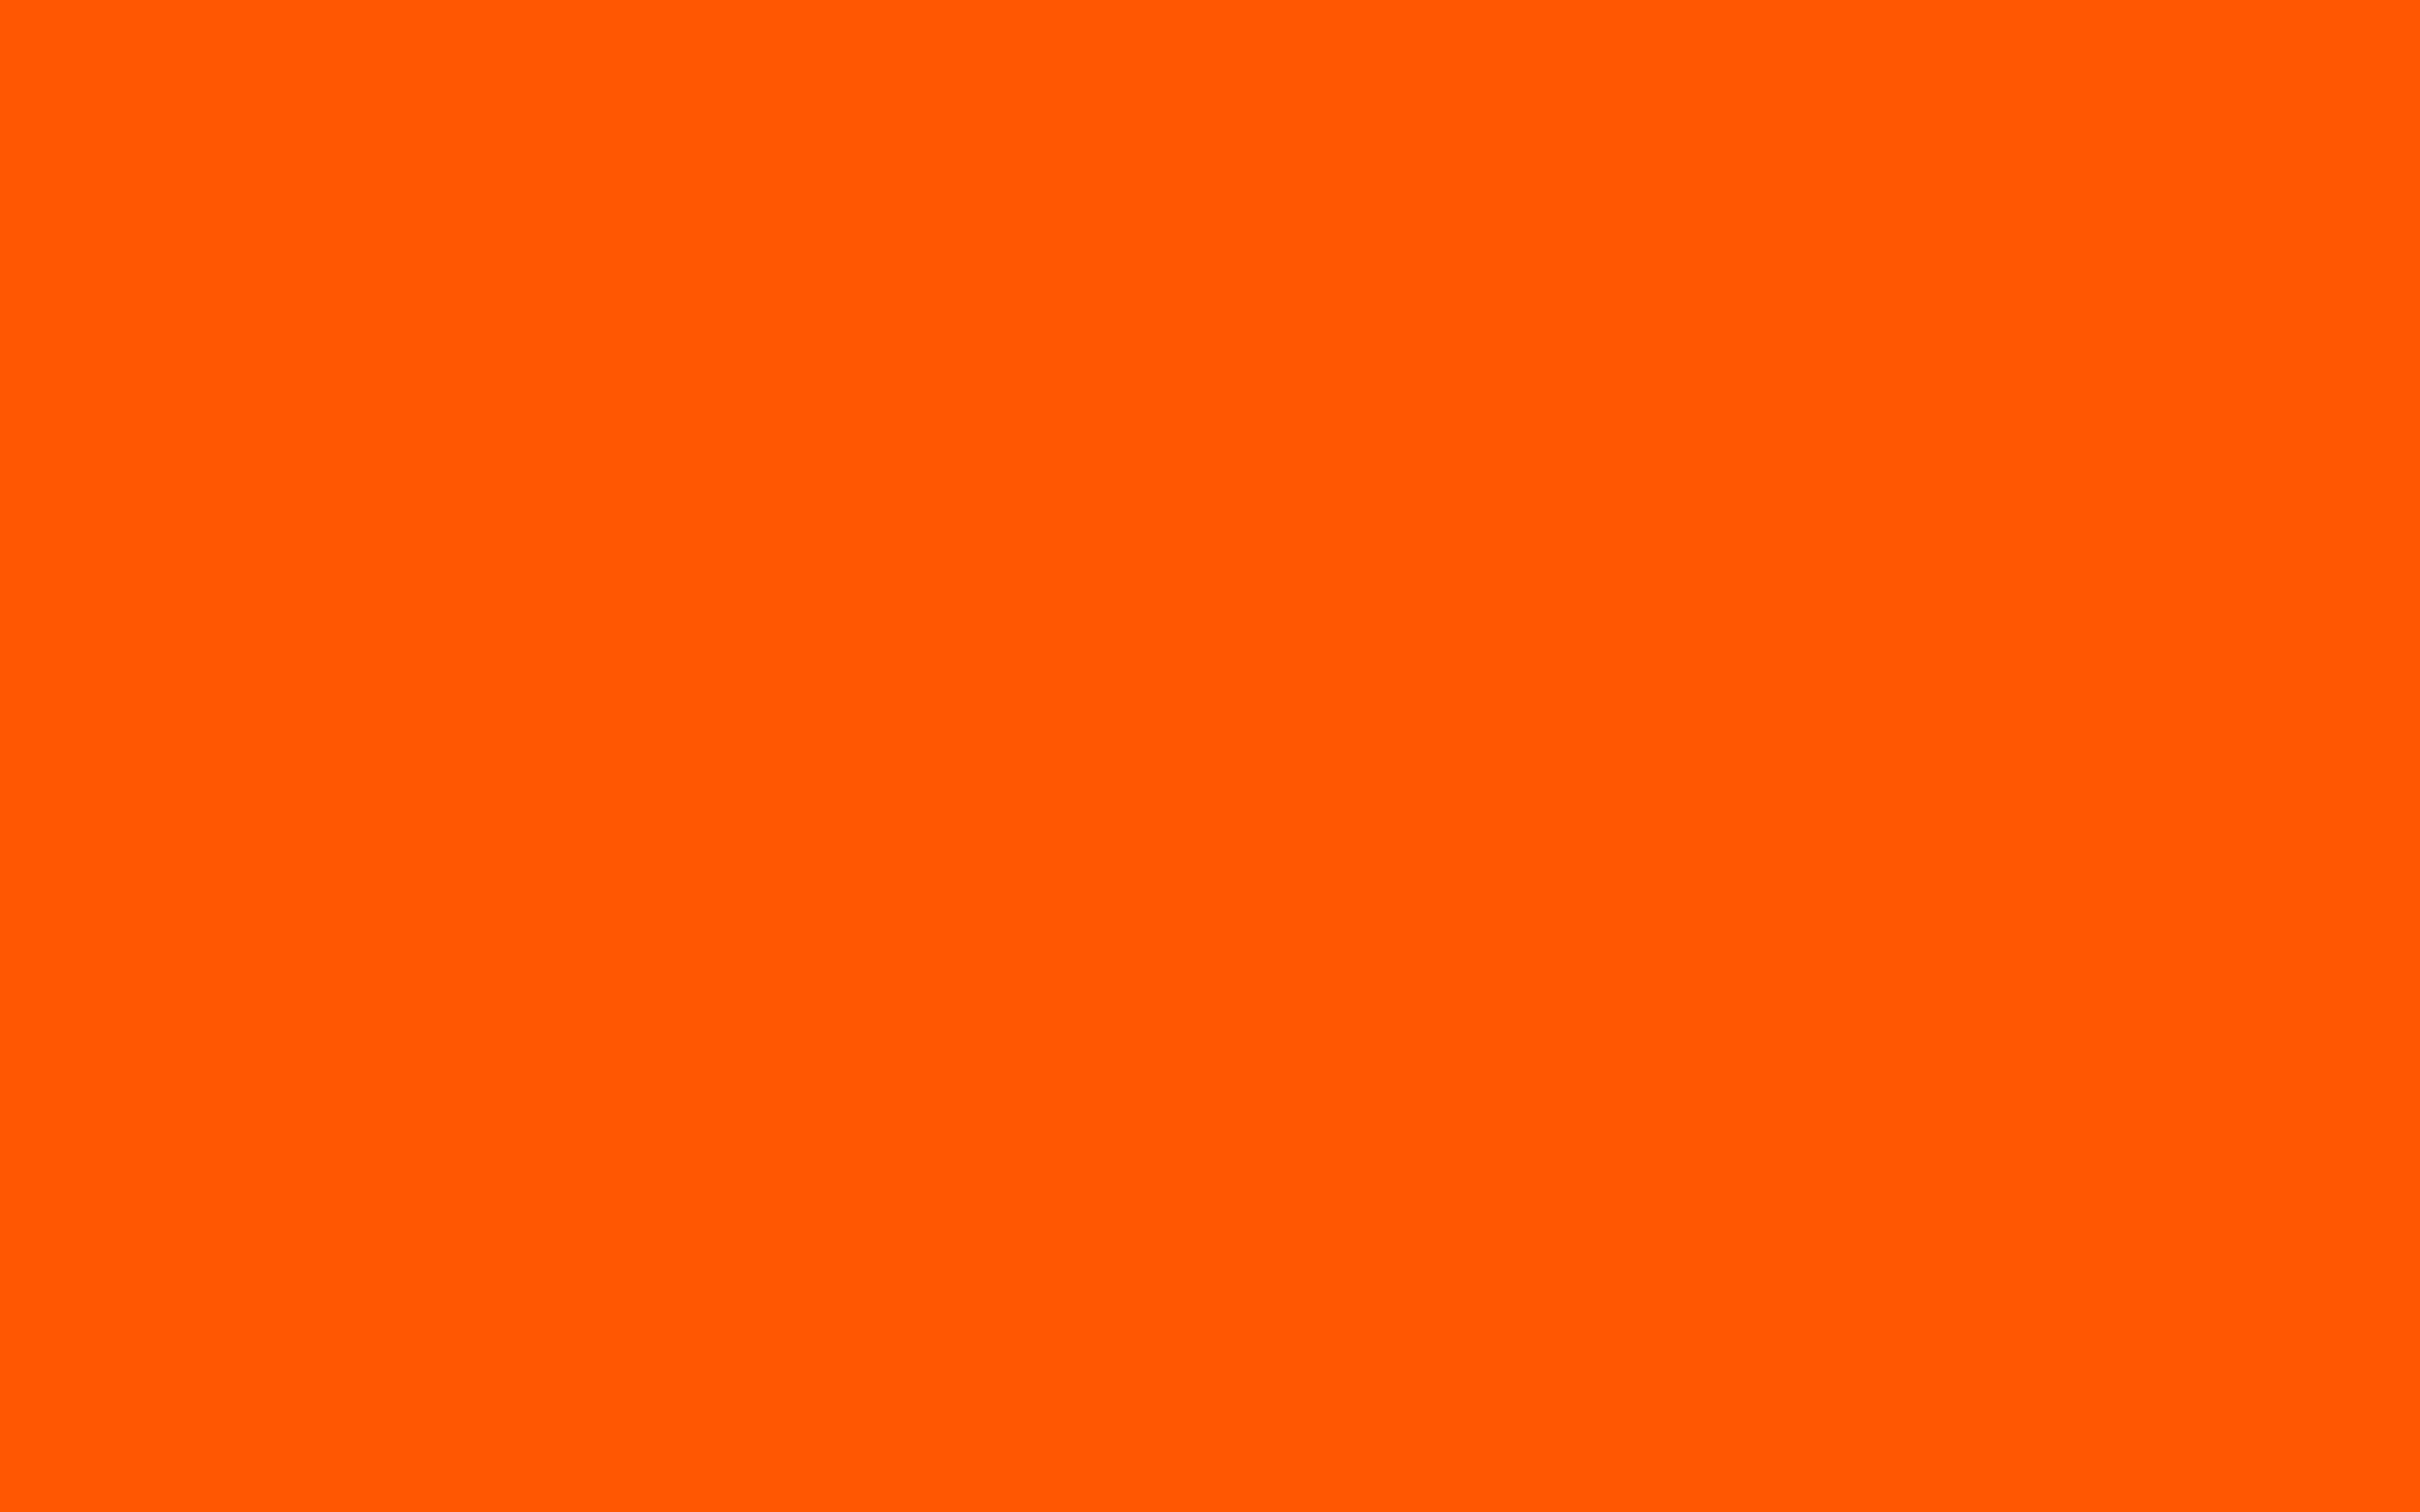 2560x1600 Orange Pantone Solid Color Background